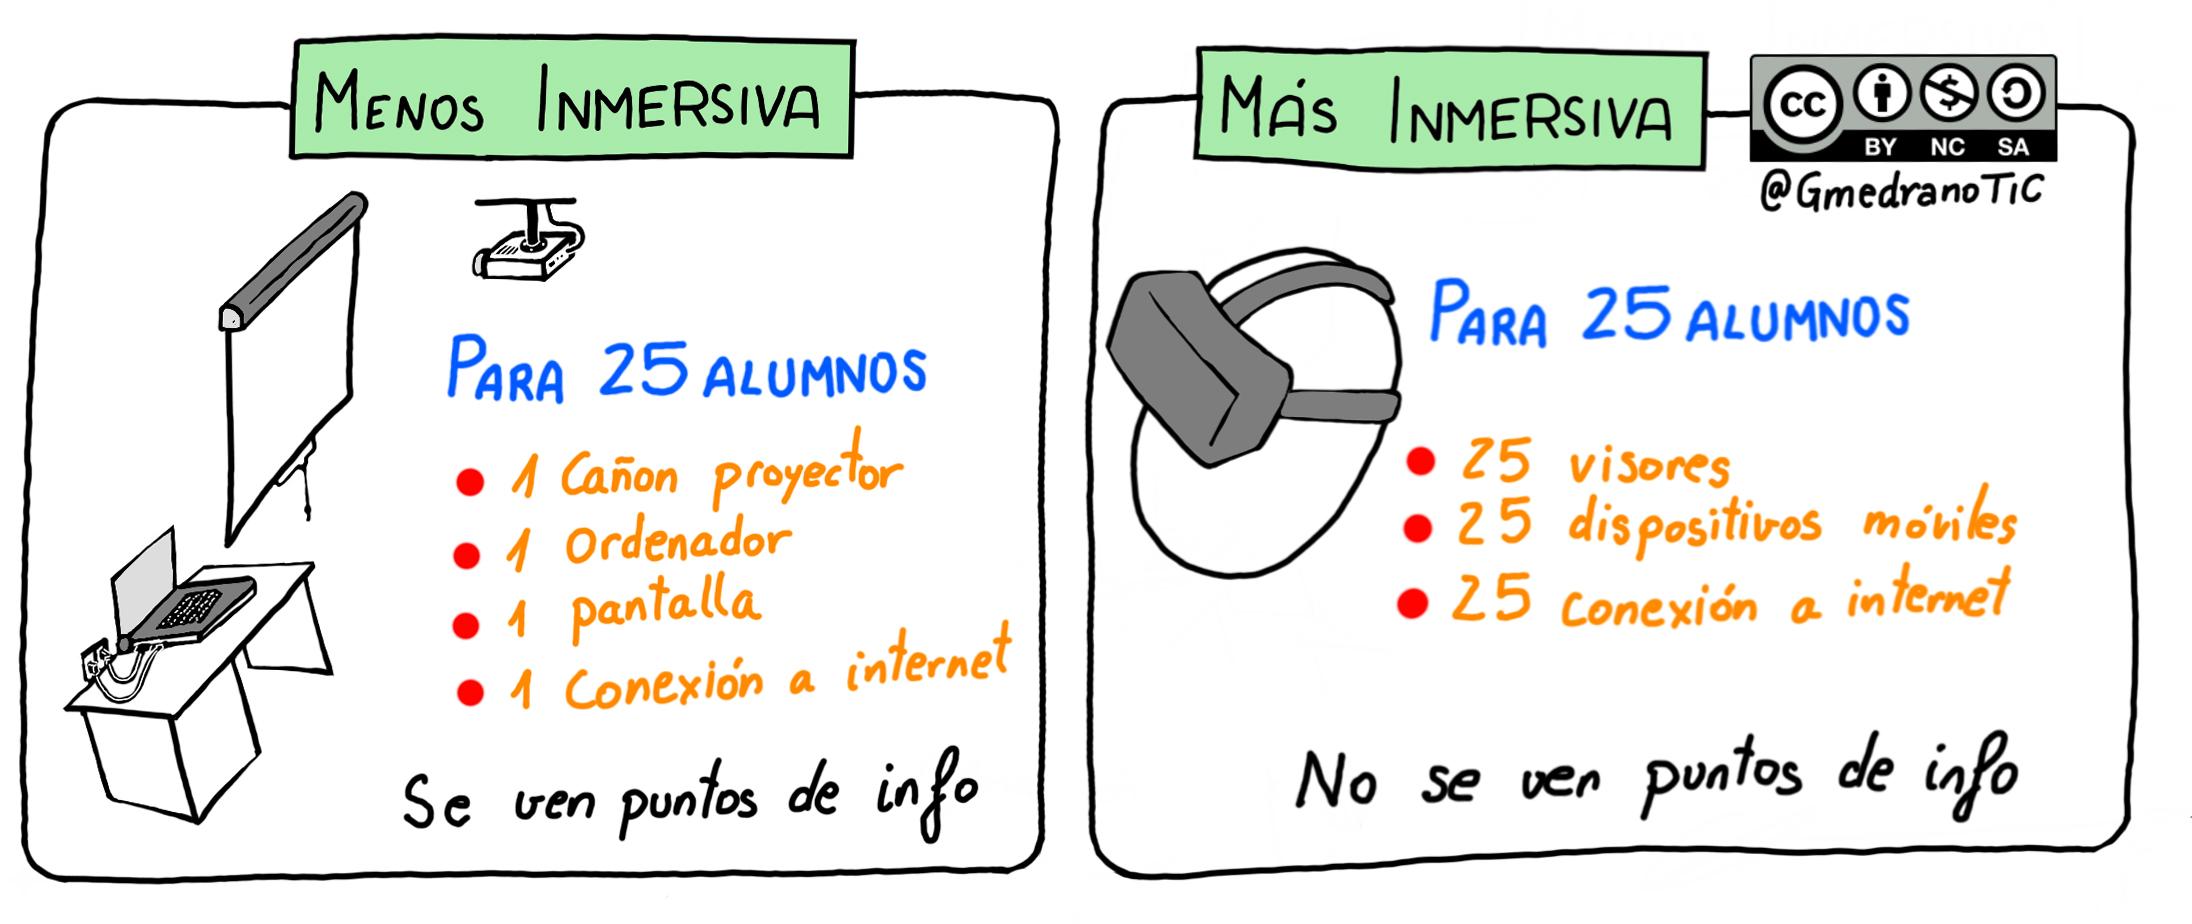 Posibilidades de visualización (CC-BY-NC-SA GmedranoTIC)